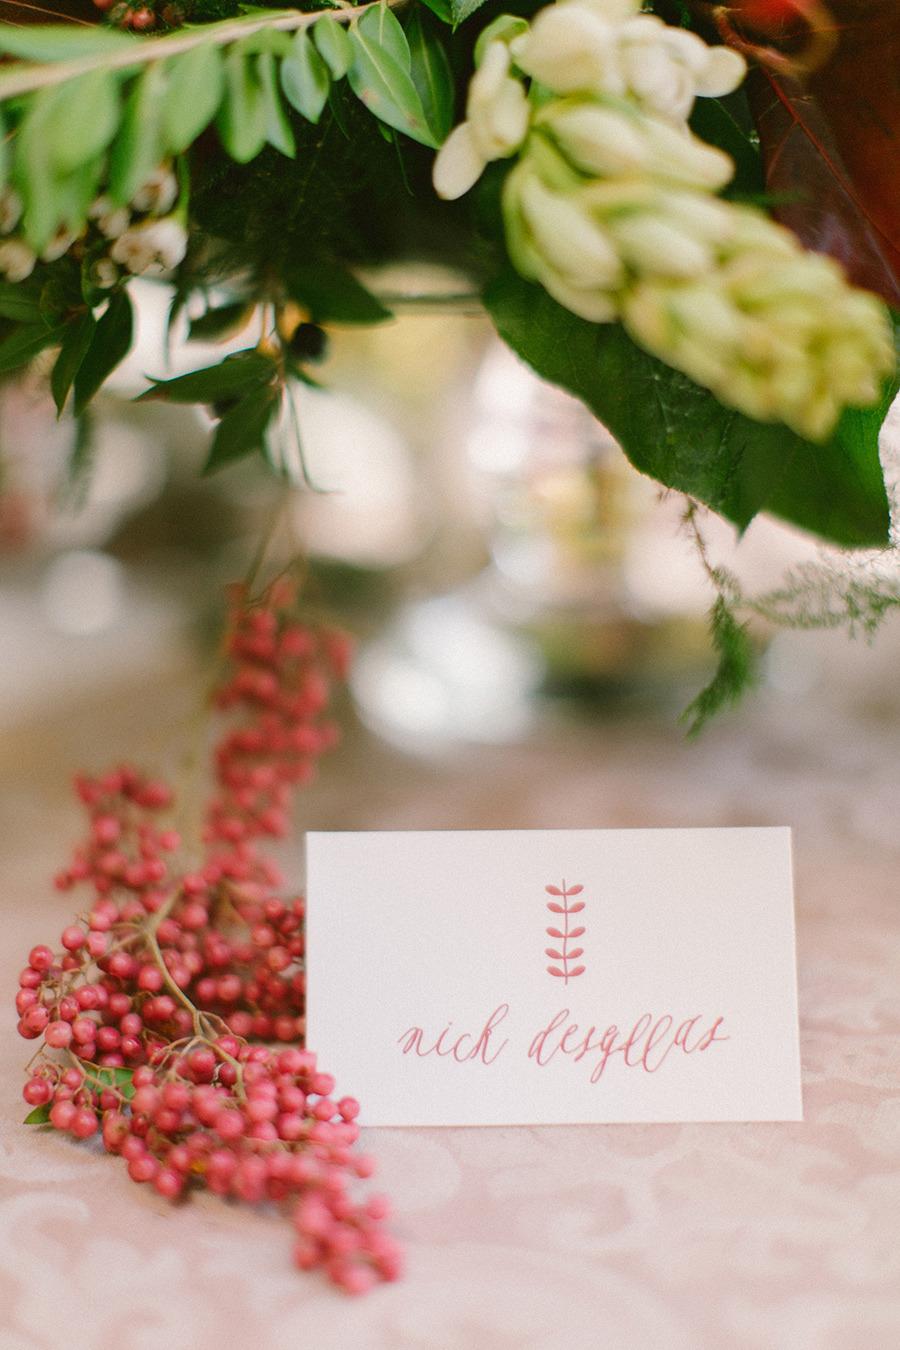 calligraphy winter wedding escort card - Boho Chic Wedding Inspiration Shoot from Anna Roussos Photography - annaroussos.com | Read more : http://www.fabmood.com/boho-chic-wedding-inspiration-shoot-anna-roussos-photography